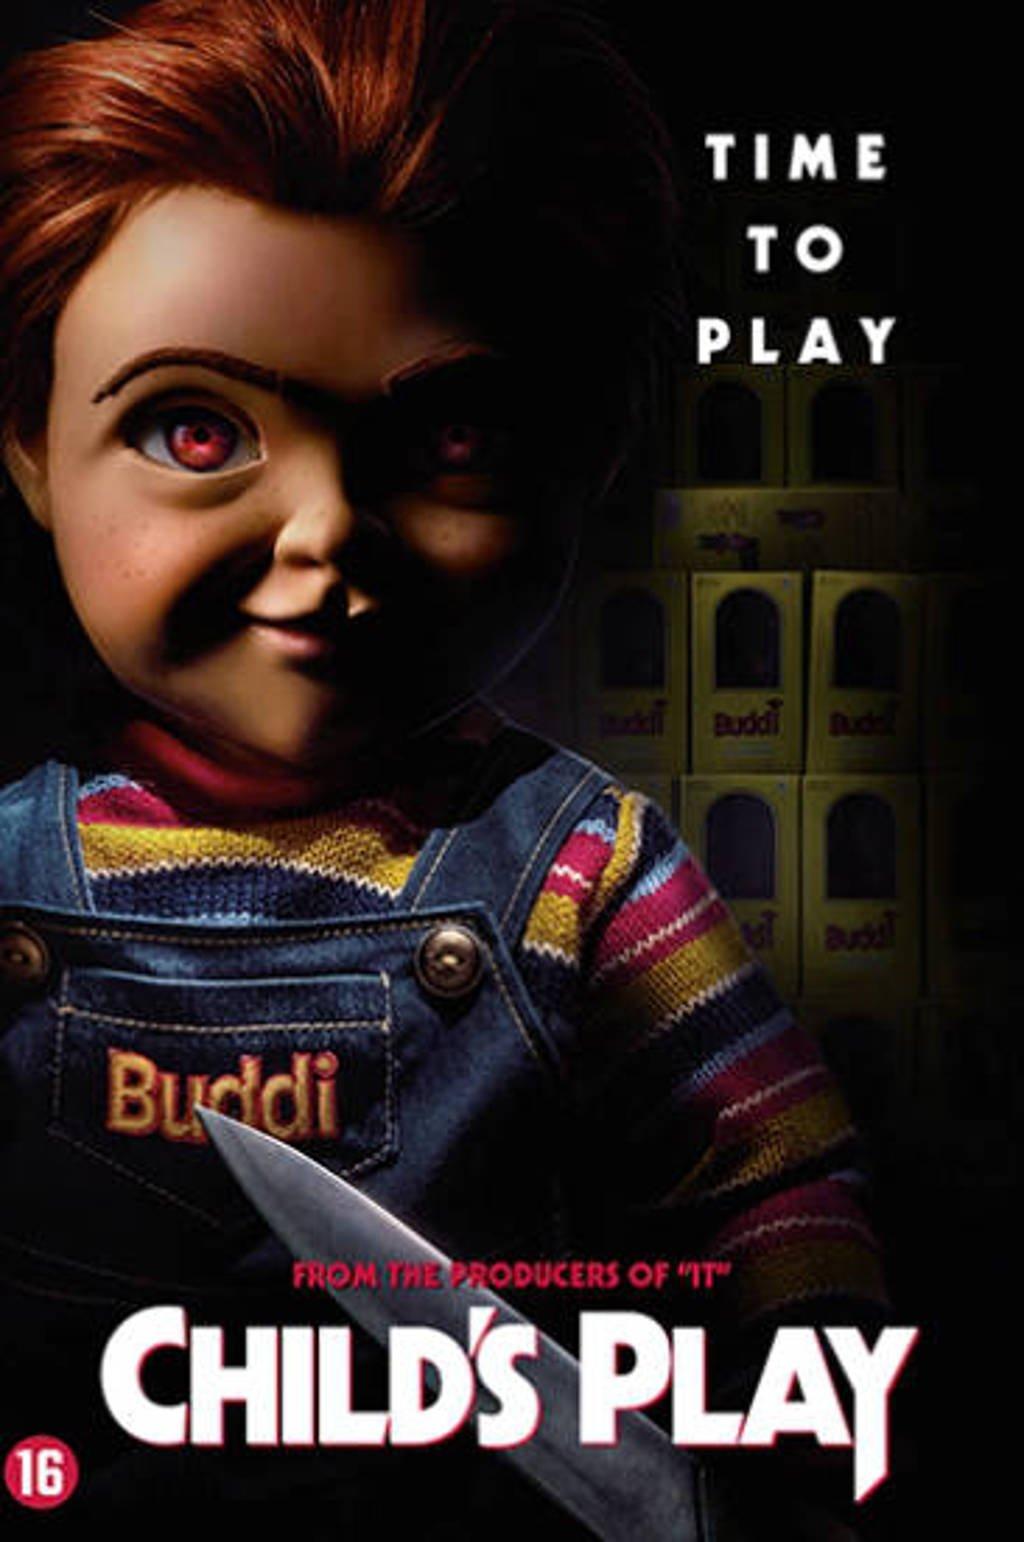 Child's play (2019) (DVD)